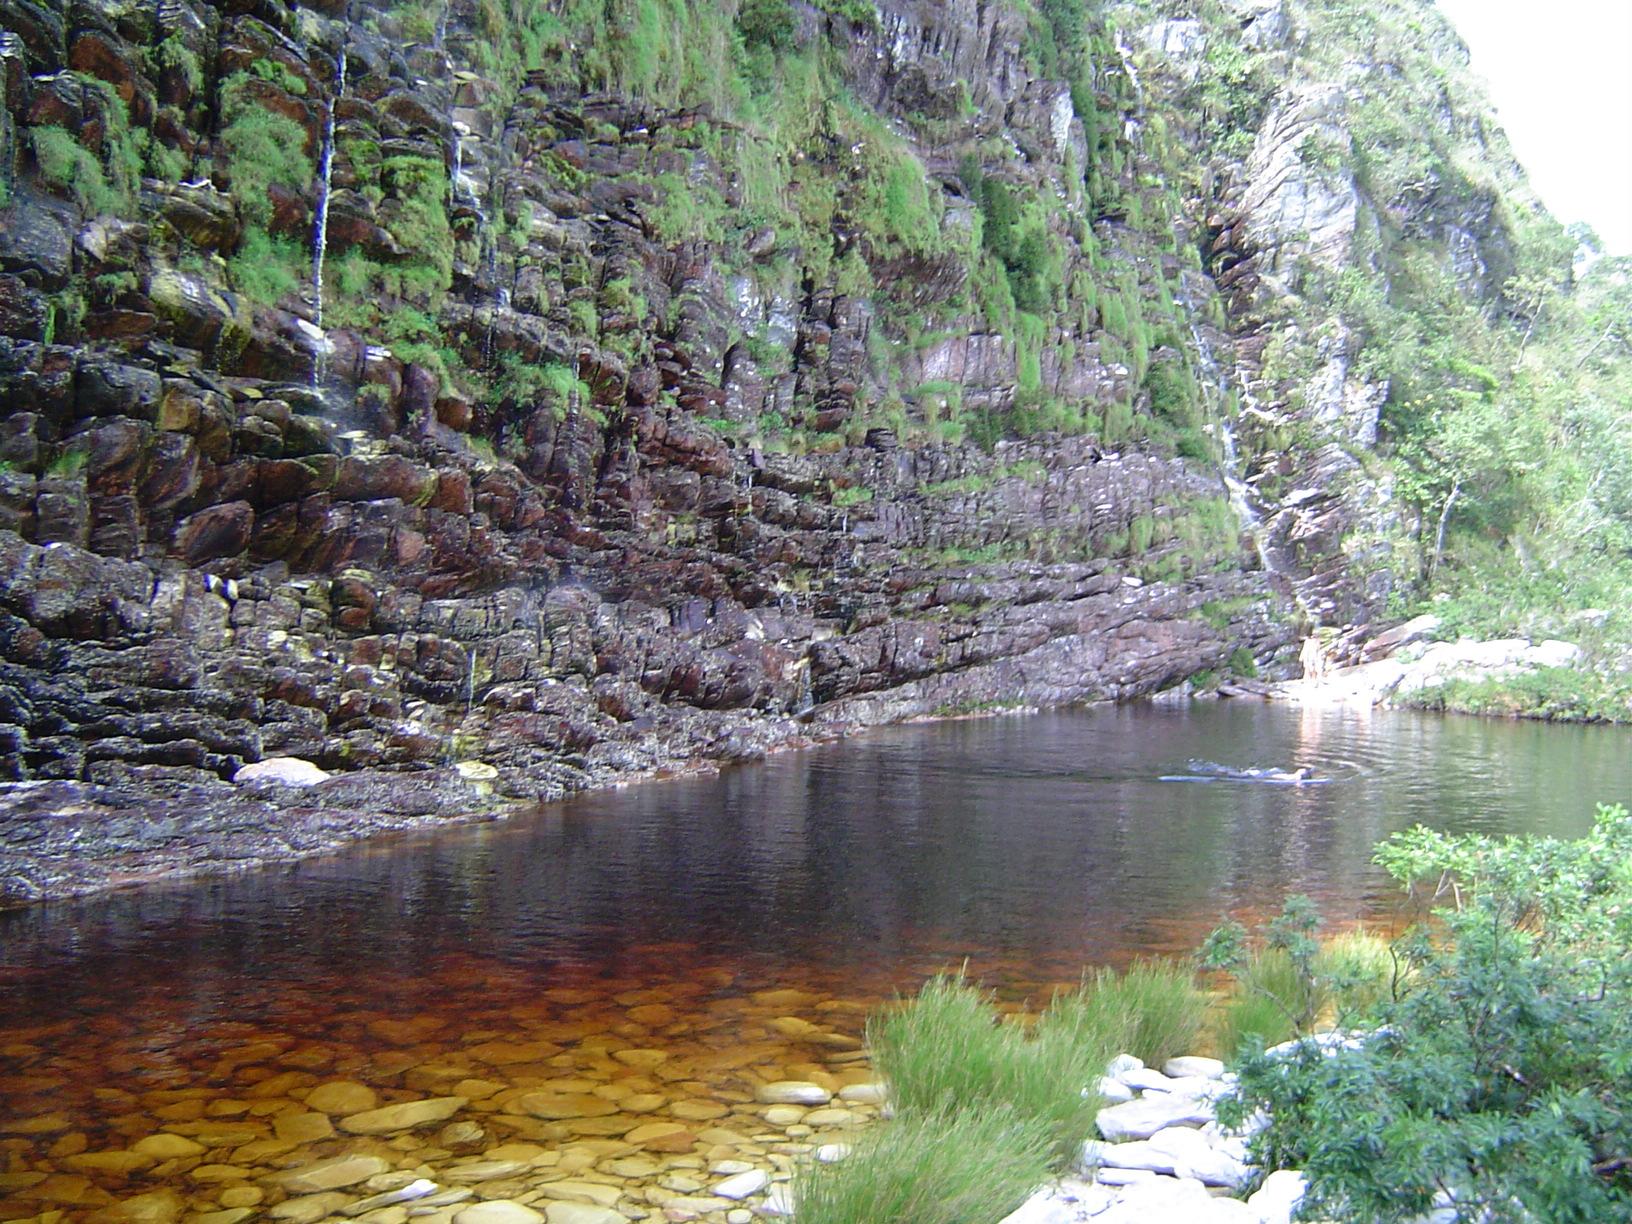 Cachoeira do Lajeado